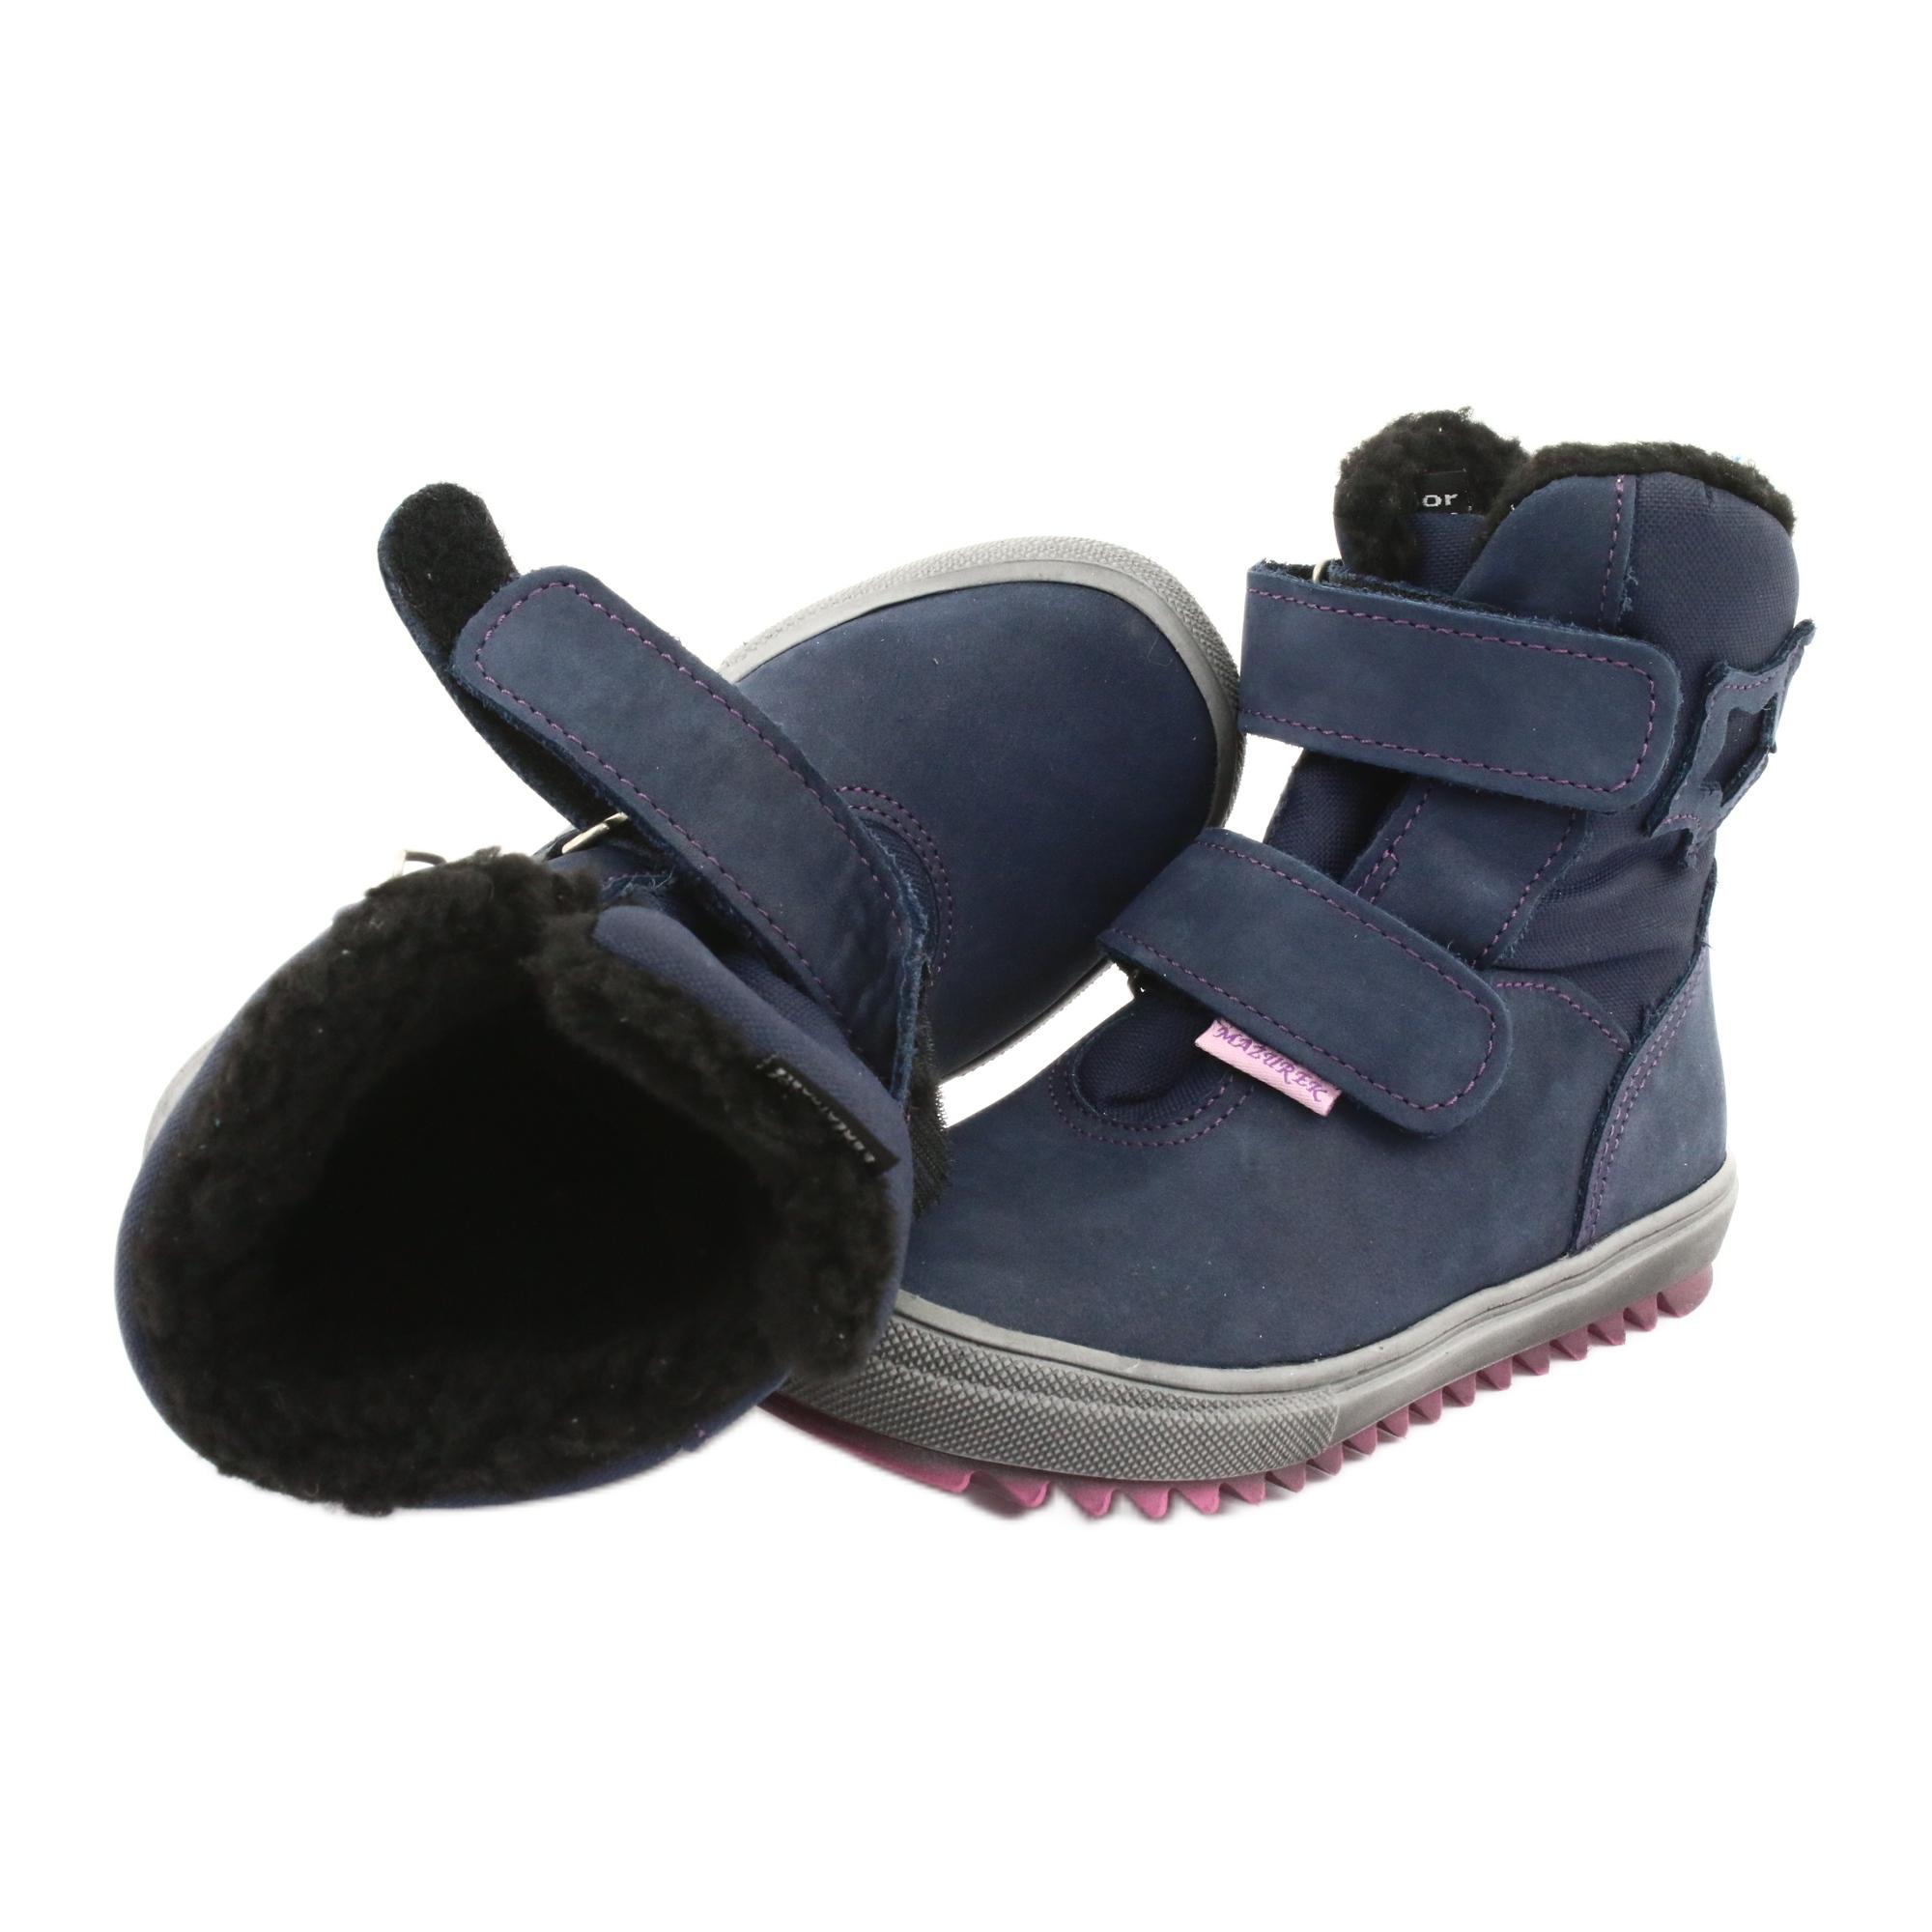 miniatura 5 - Stivali con una membrana Mazurek 1353 blu scuro marina rosa